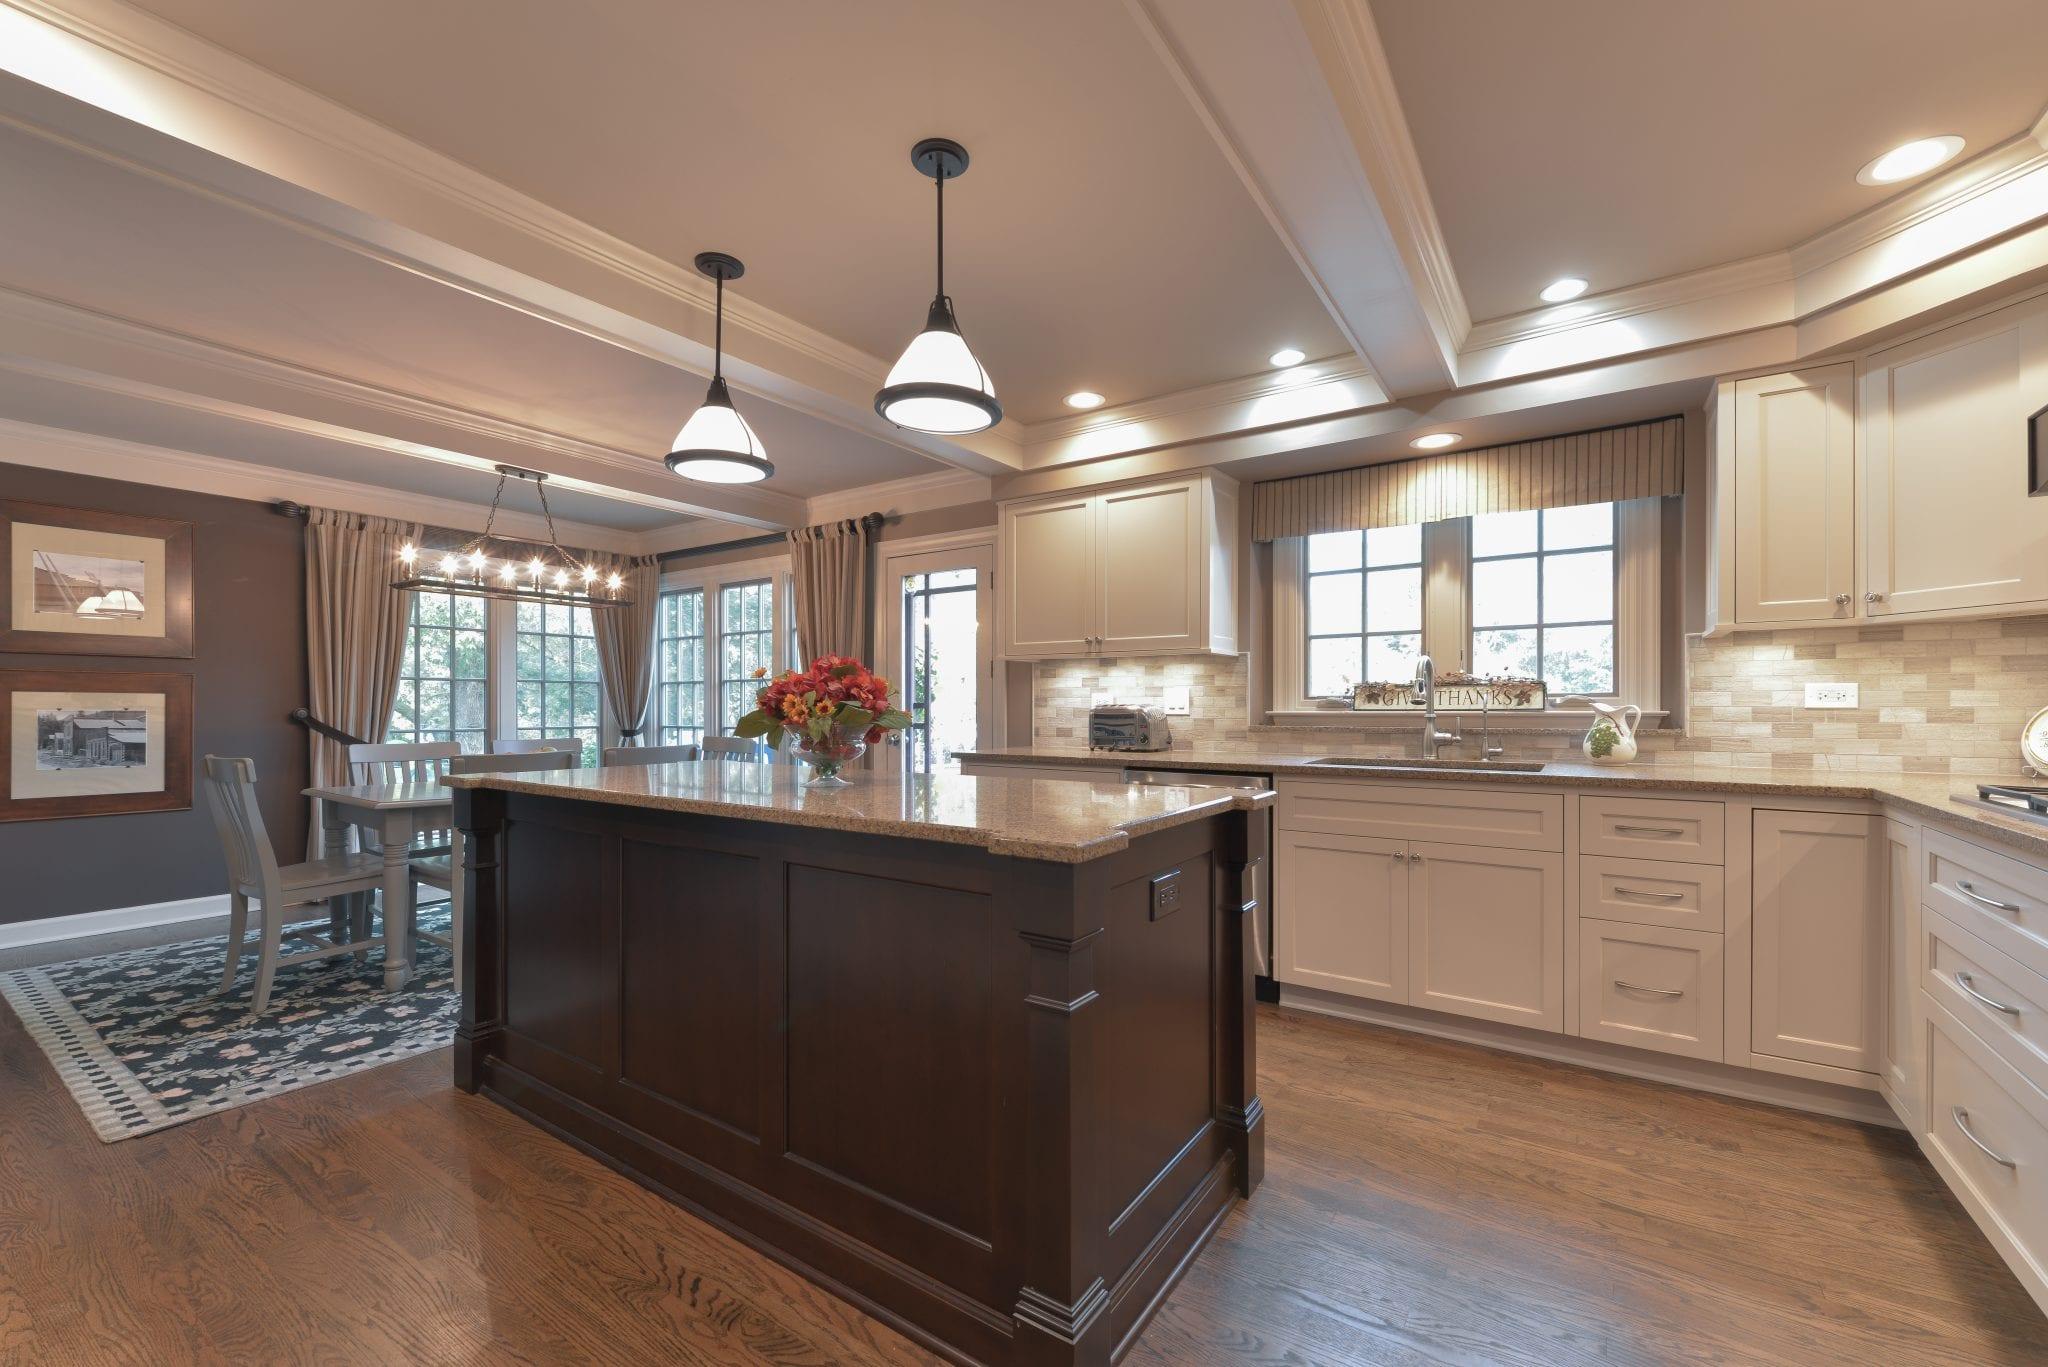 Customized Kitchen Renovations